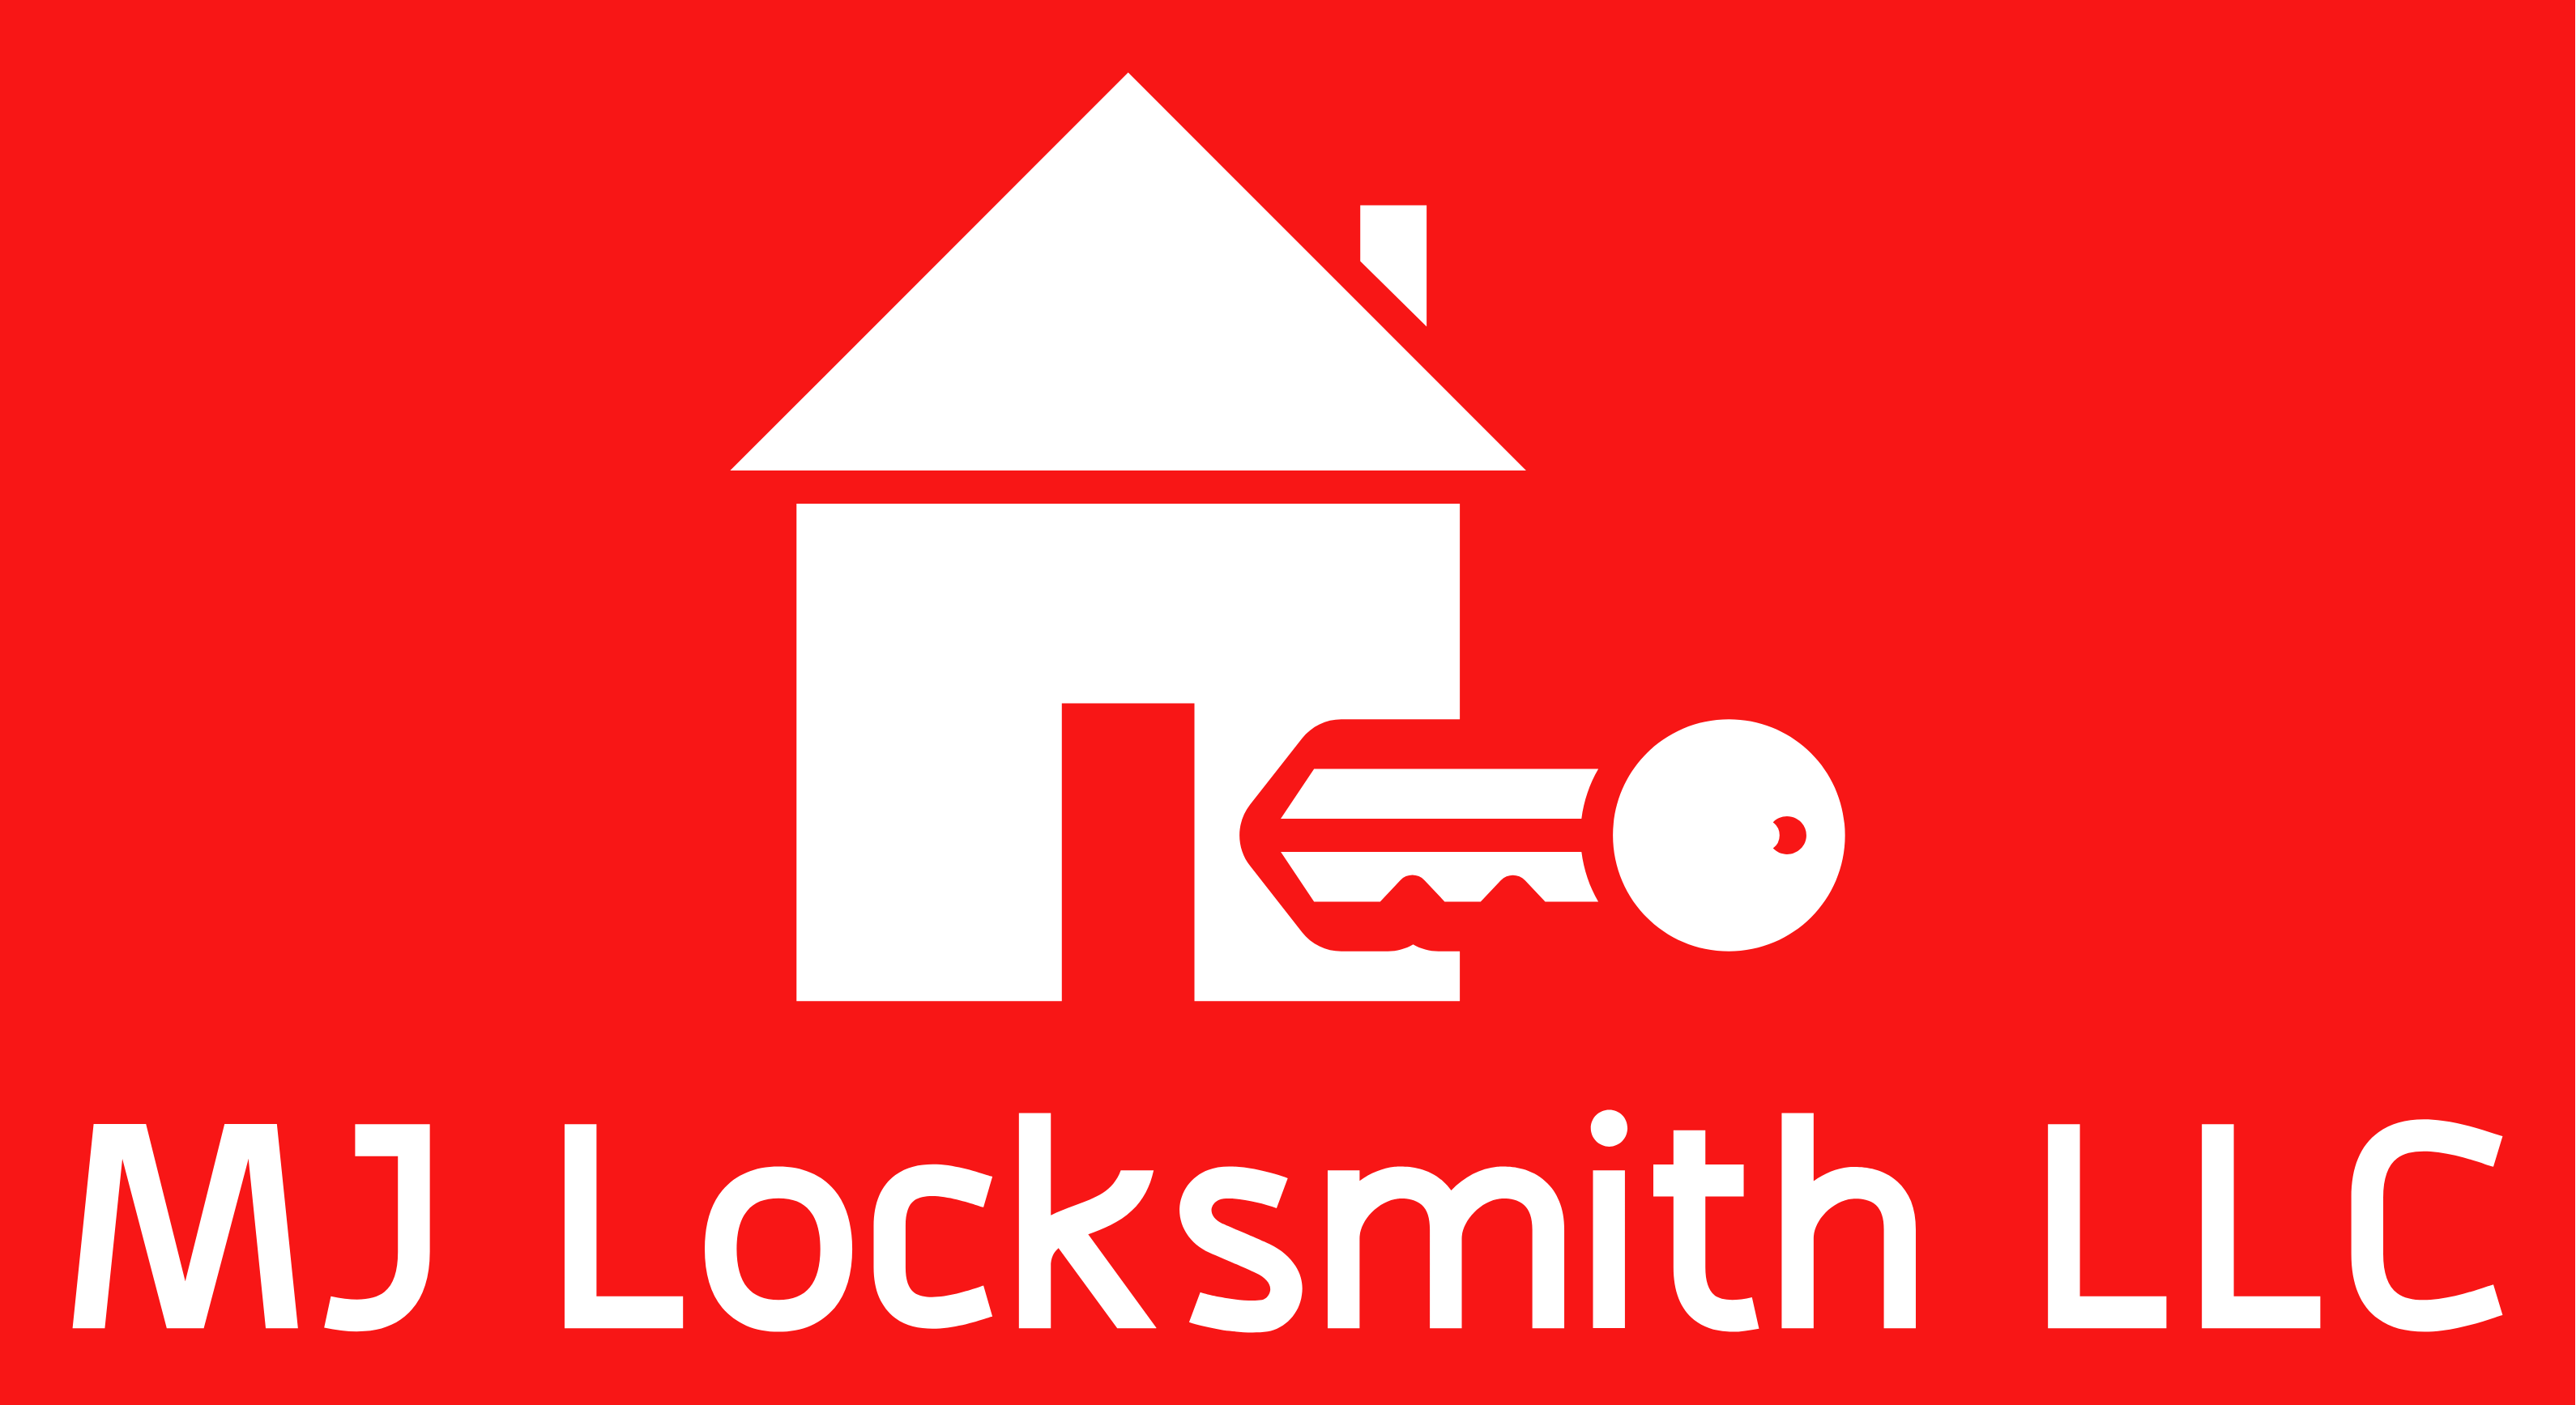 * MJ Locksmith LLC - Platinum Partner